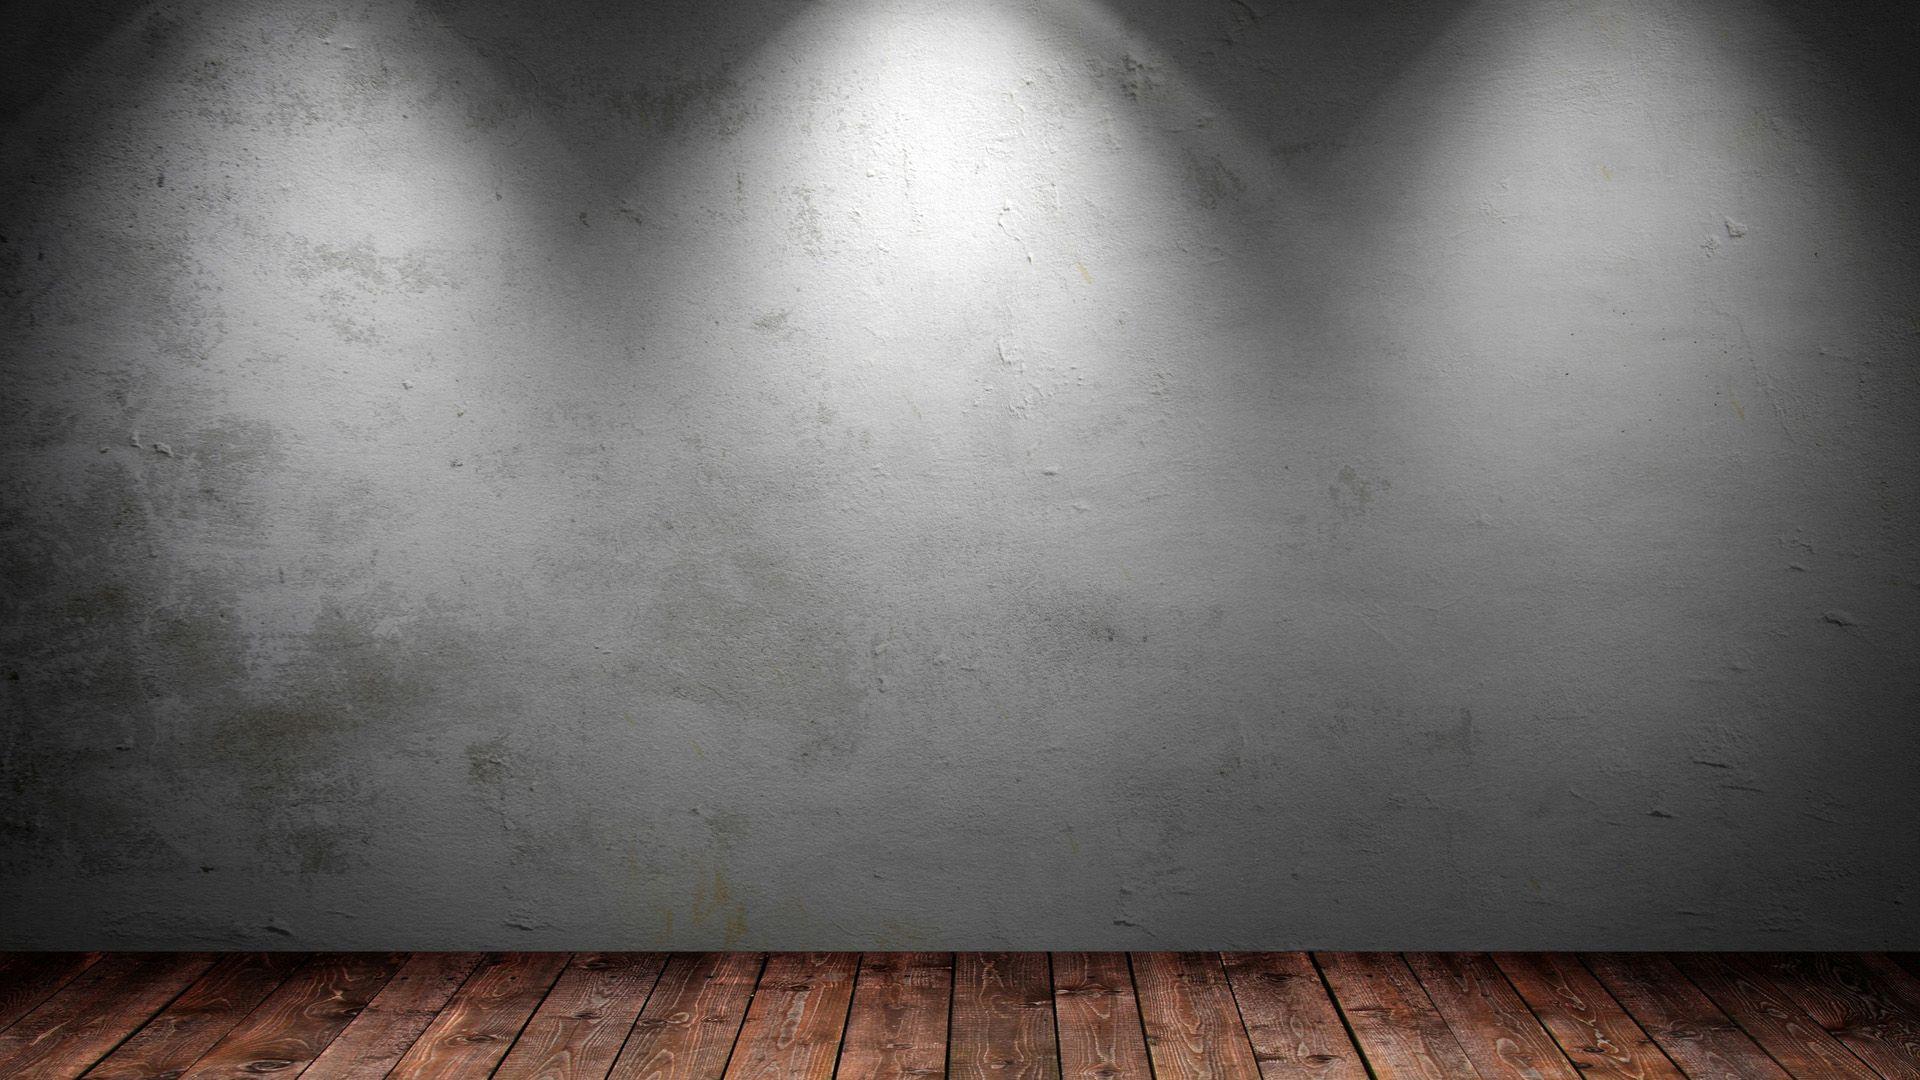 Empty Office Desktop Wallpaper - WallpaperSafari